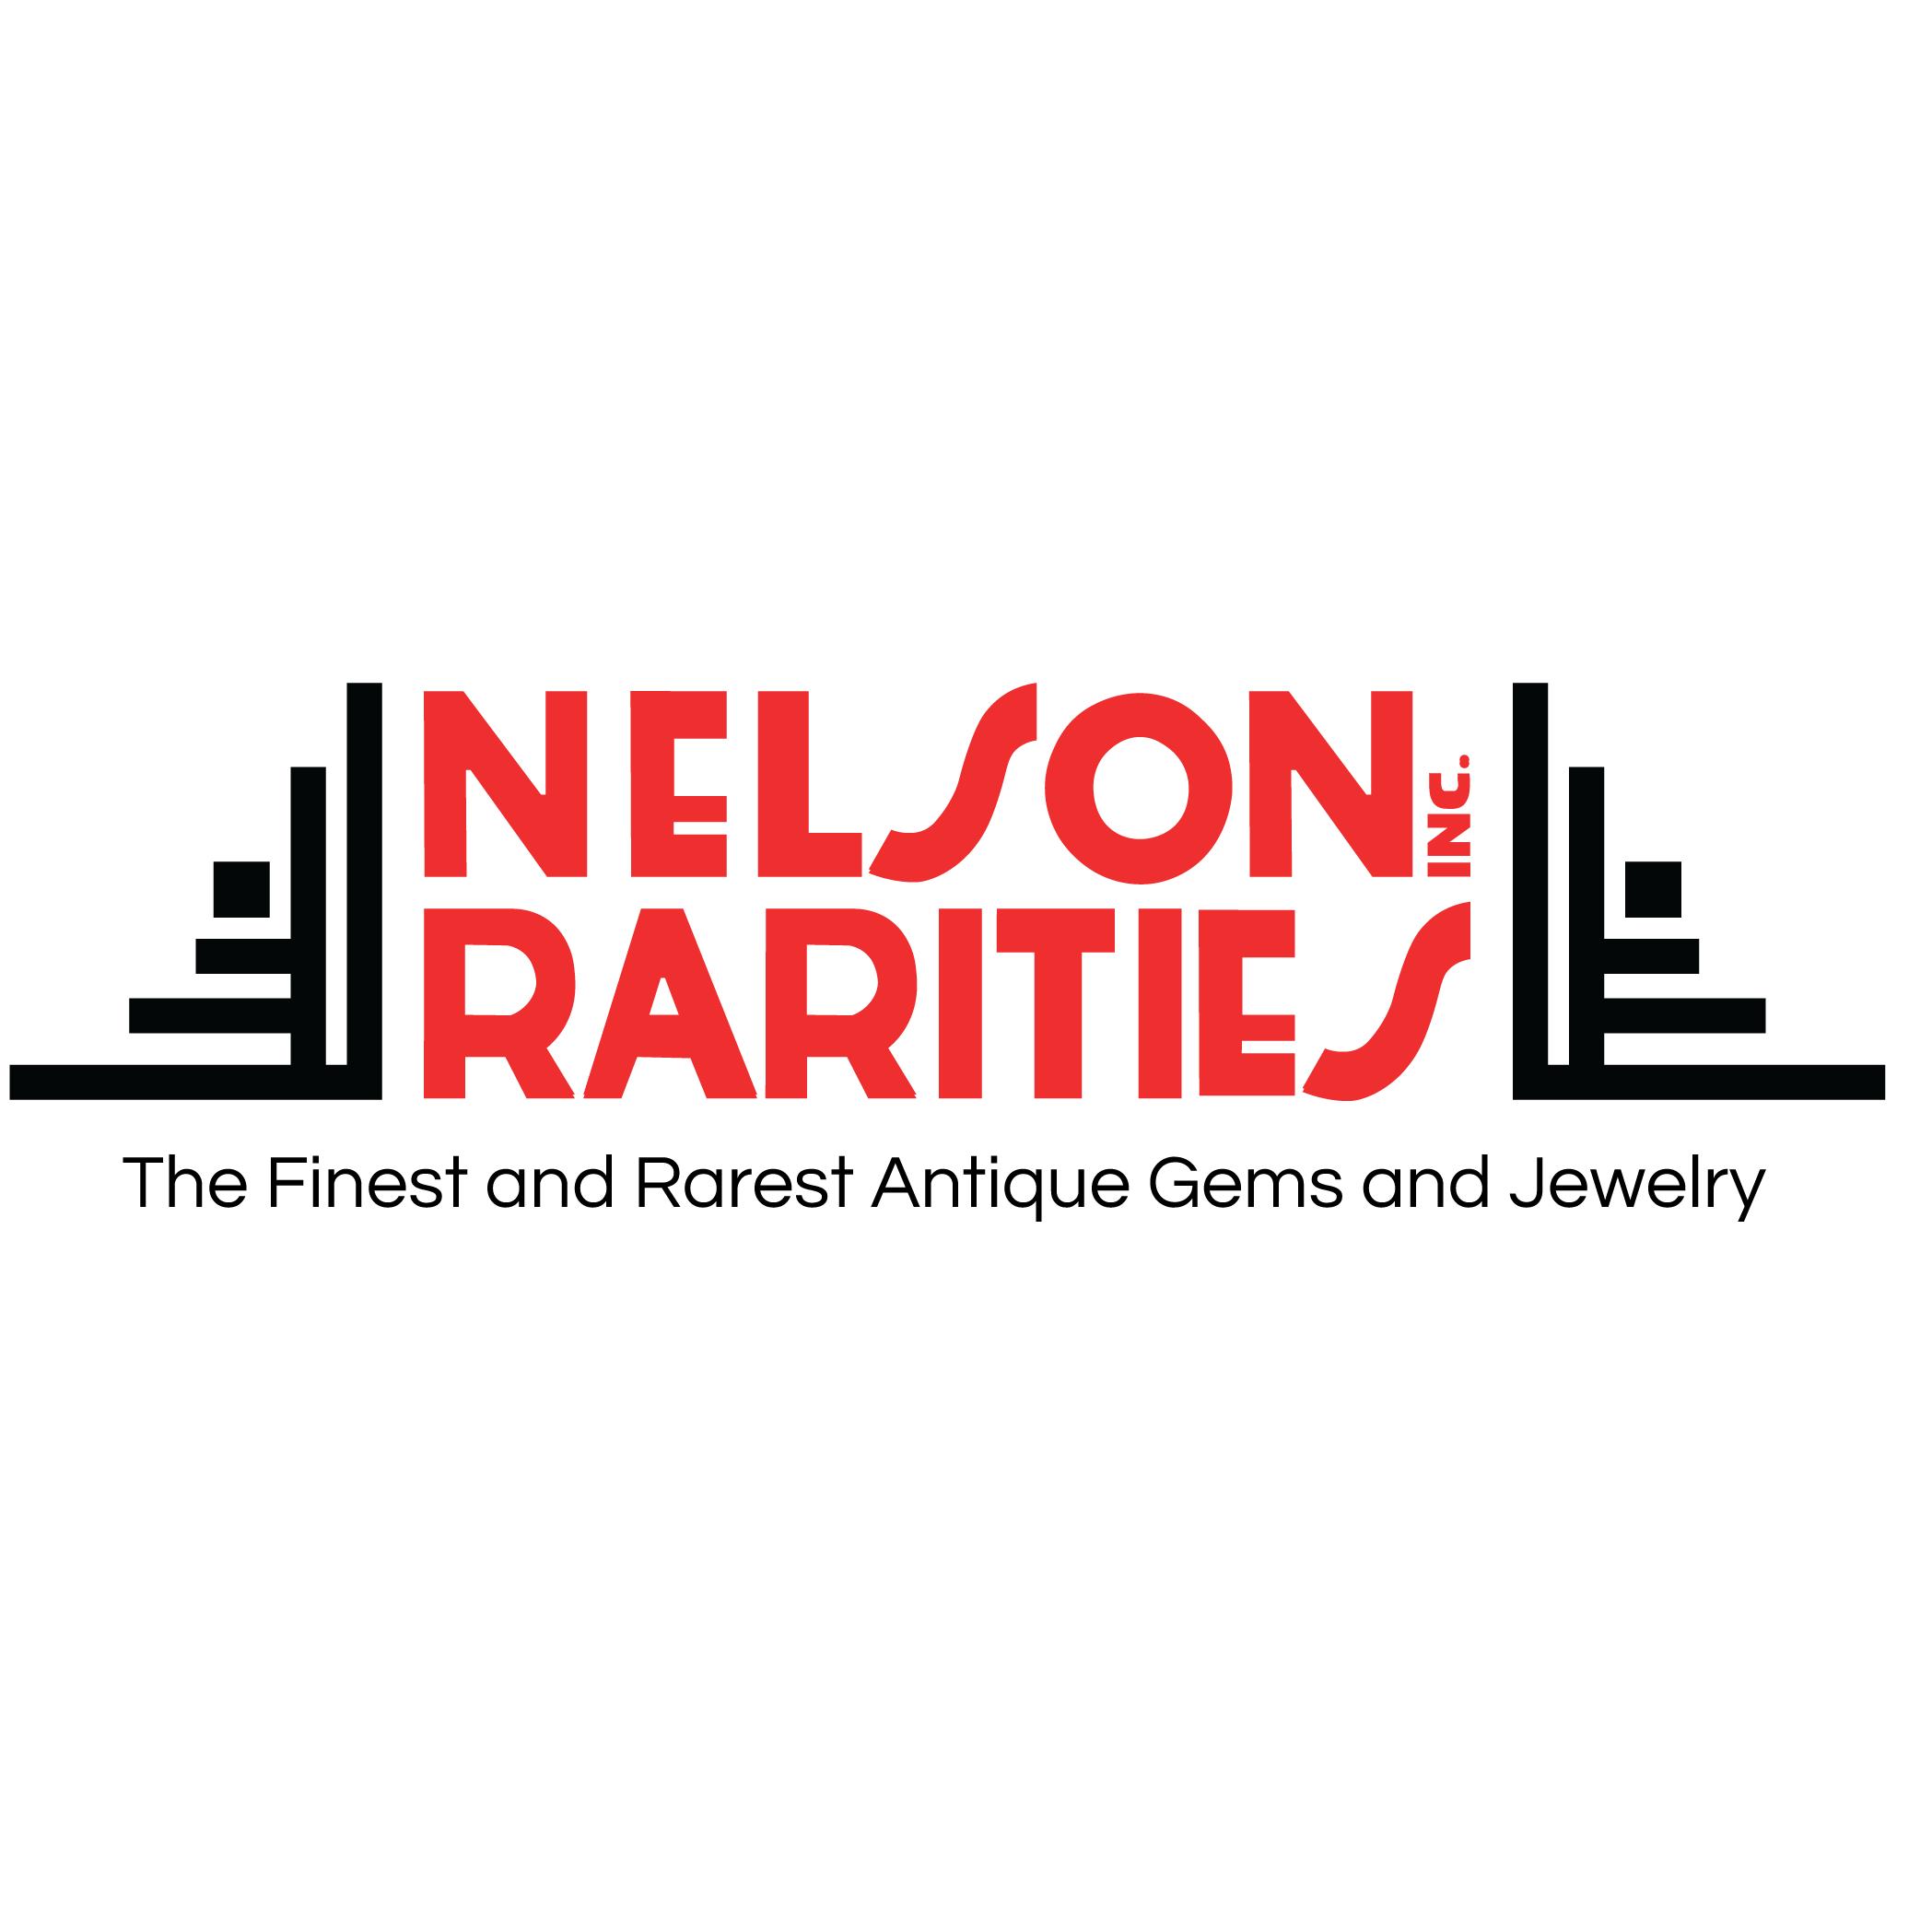 Nelson Rarities, Inc.